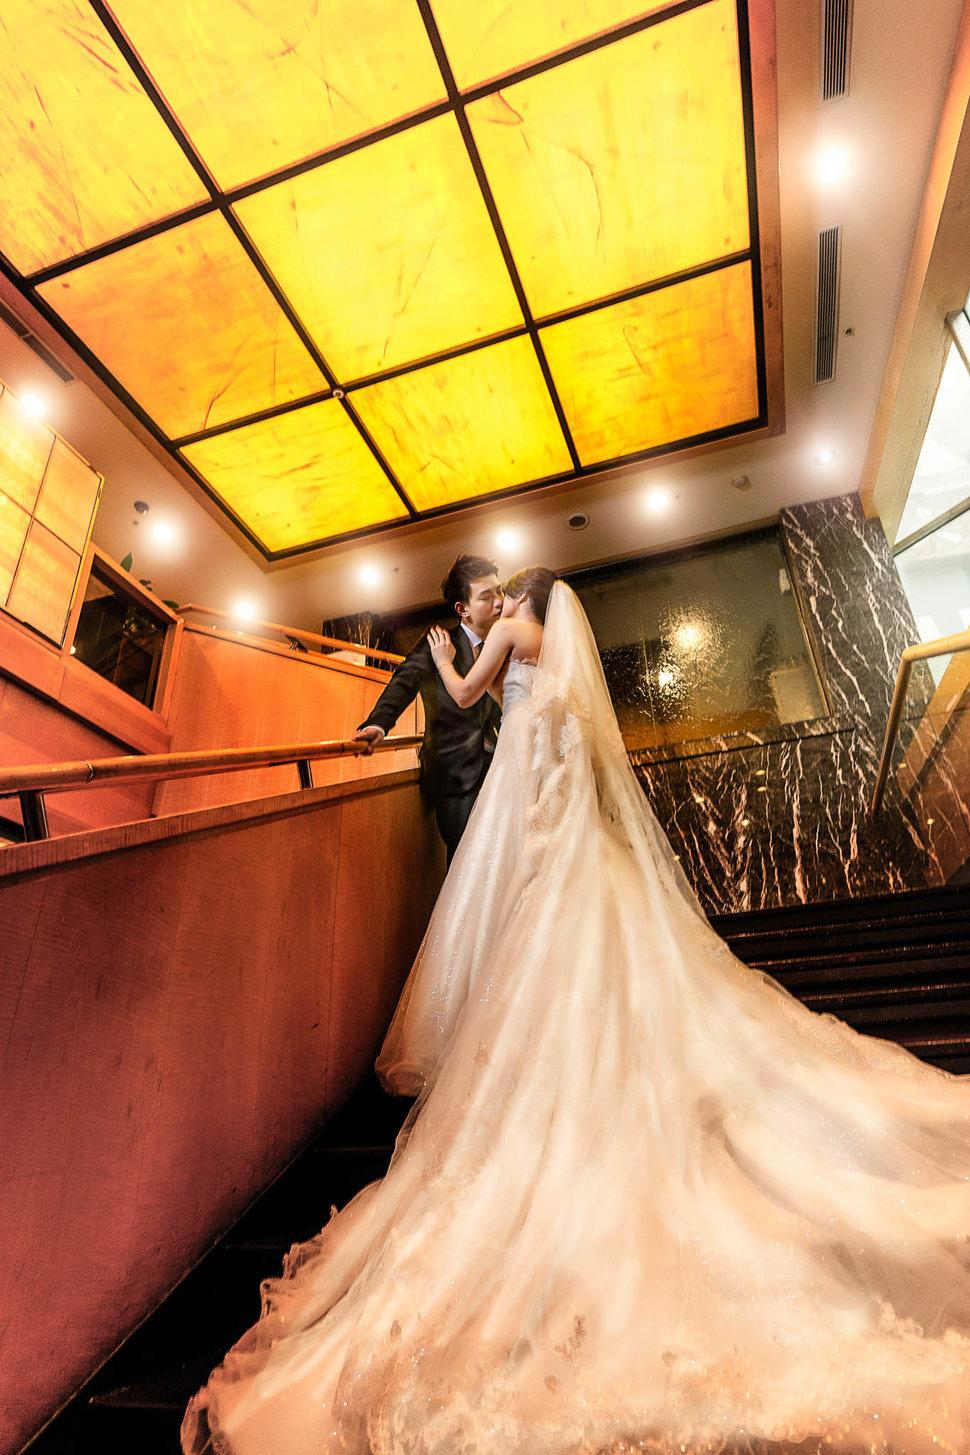 18PHOTO-元善❤️ 傳瑀(編號:308864) - 18PHOTO 婚紗影像攝影工作室 - 結婚吧一站式婚禮服務平台